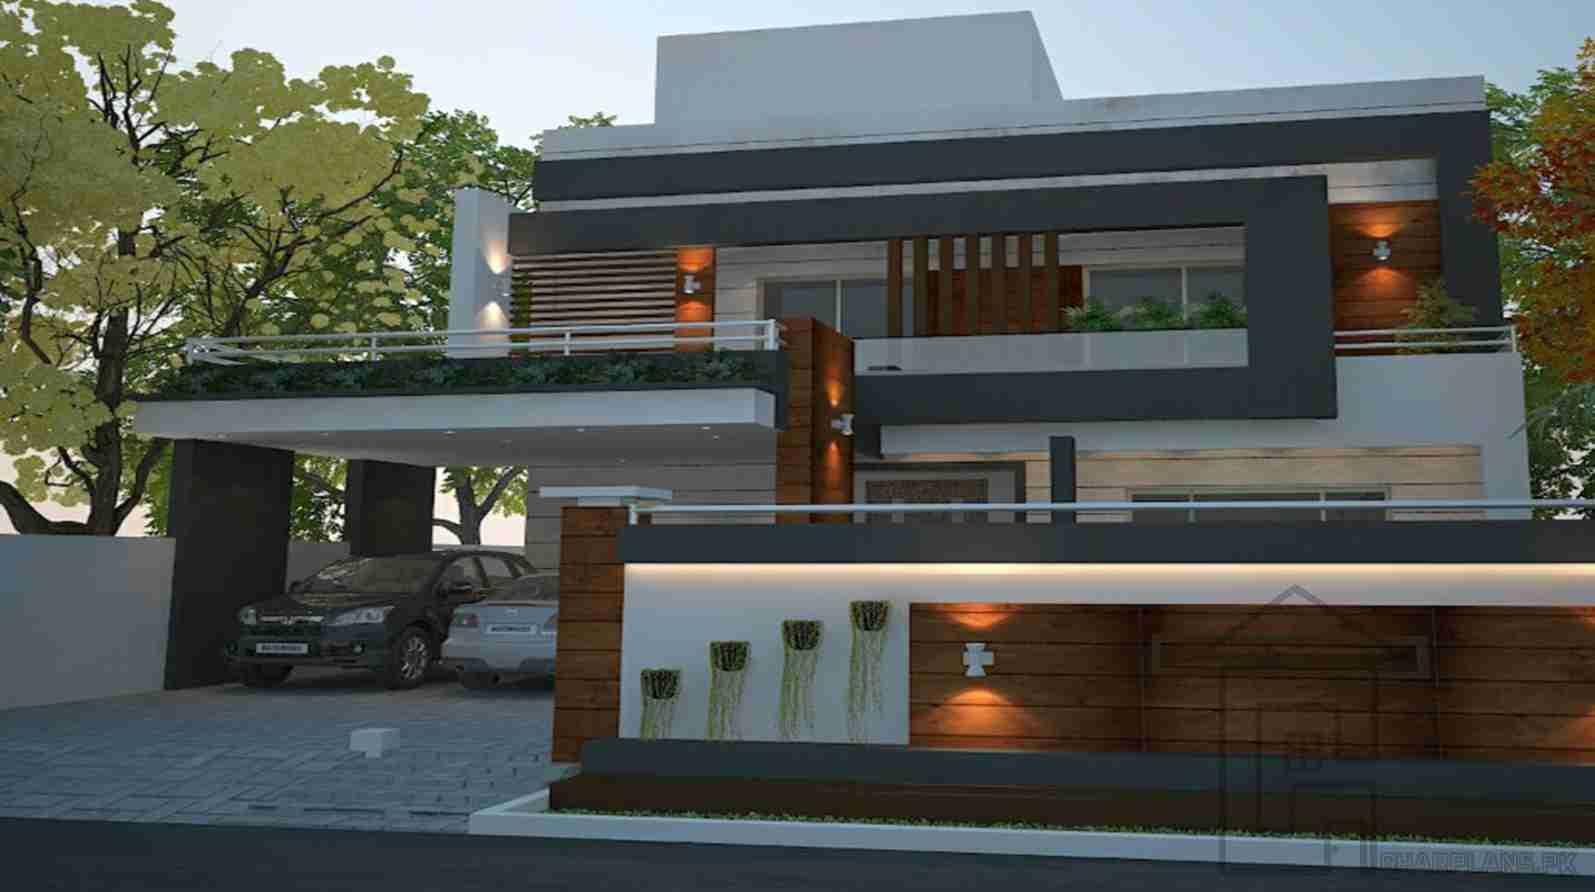 14 marla pakistani house plan front elevaton small house designs